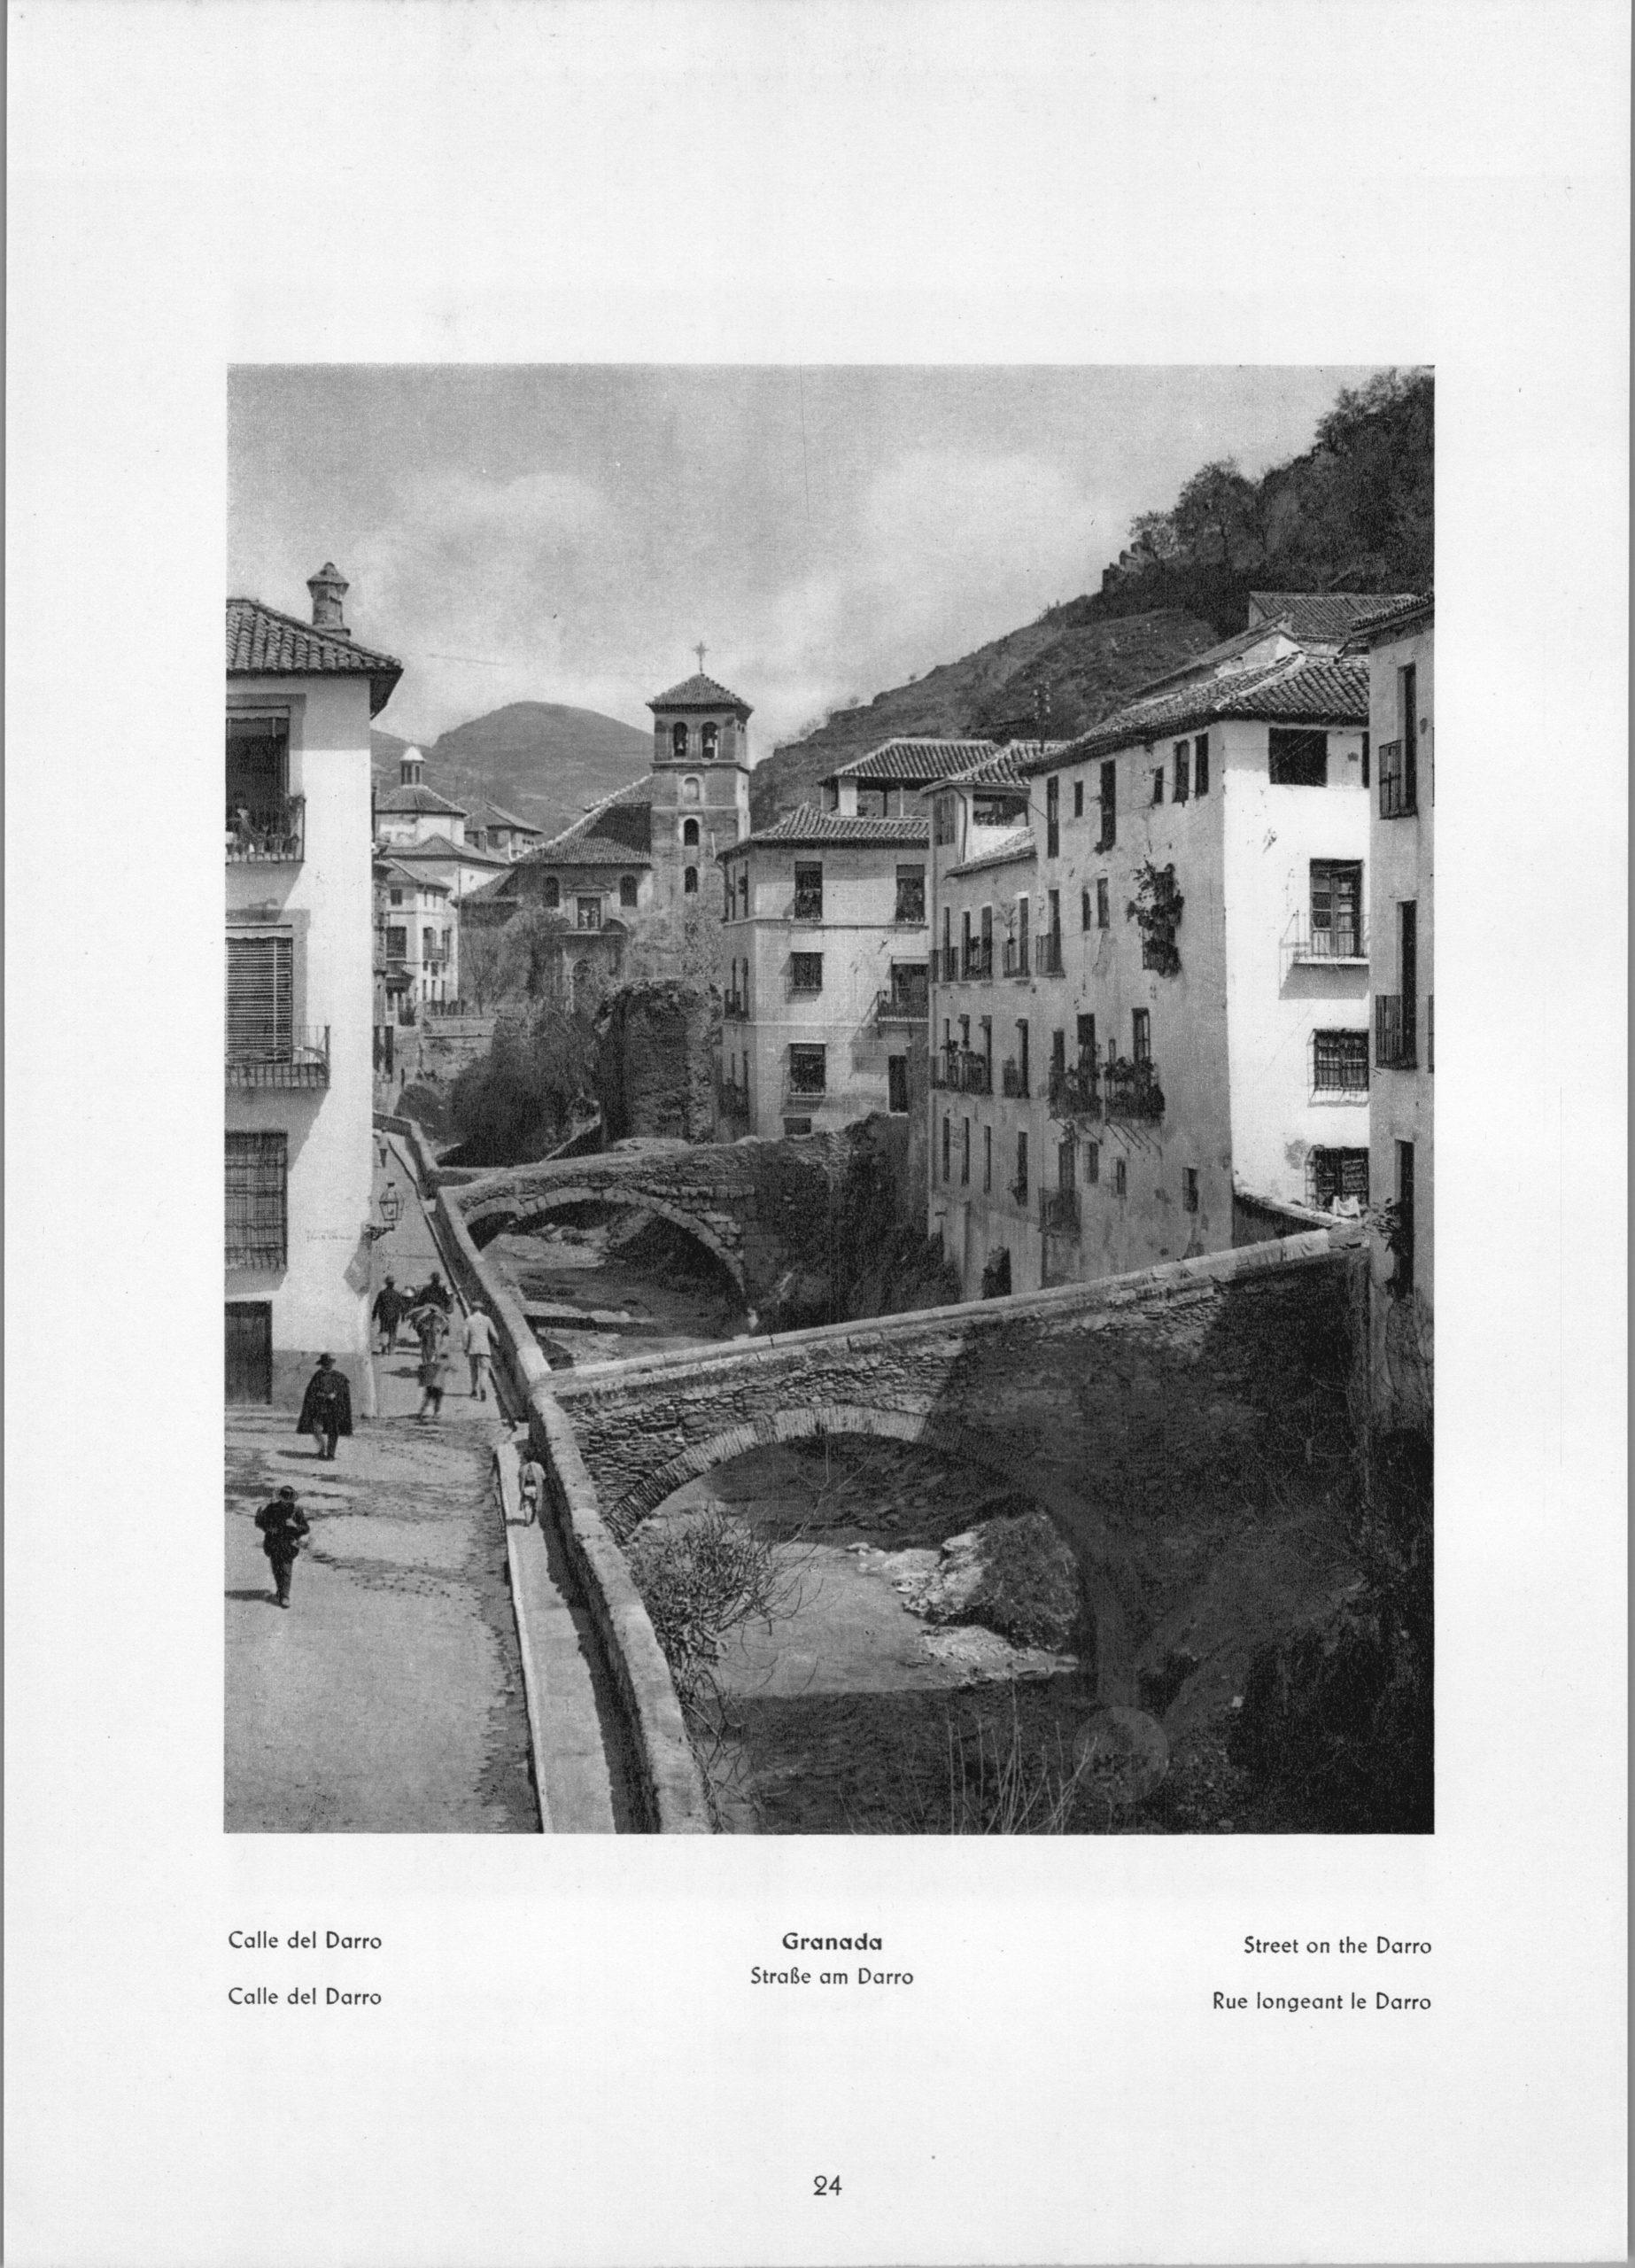 Granada Darro - Street on the Darro